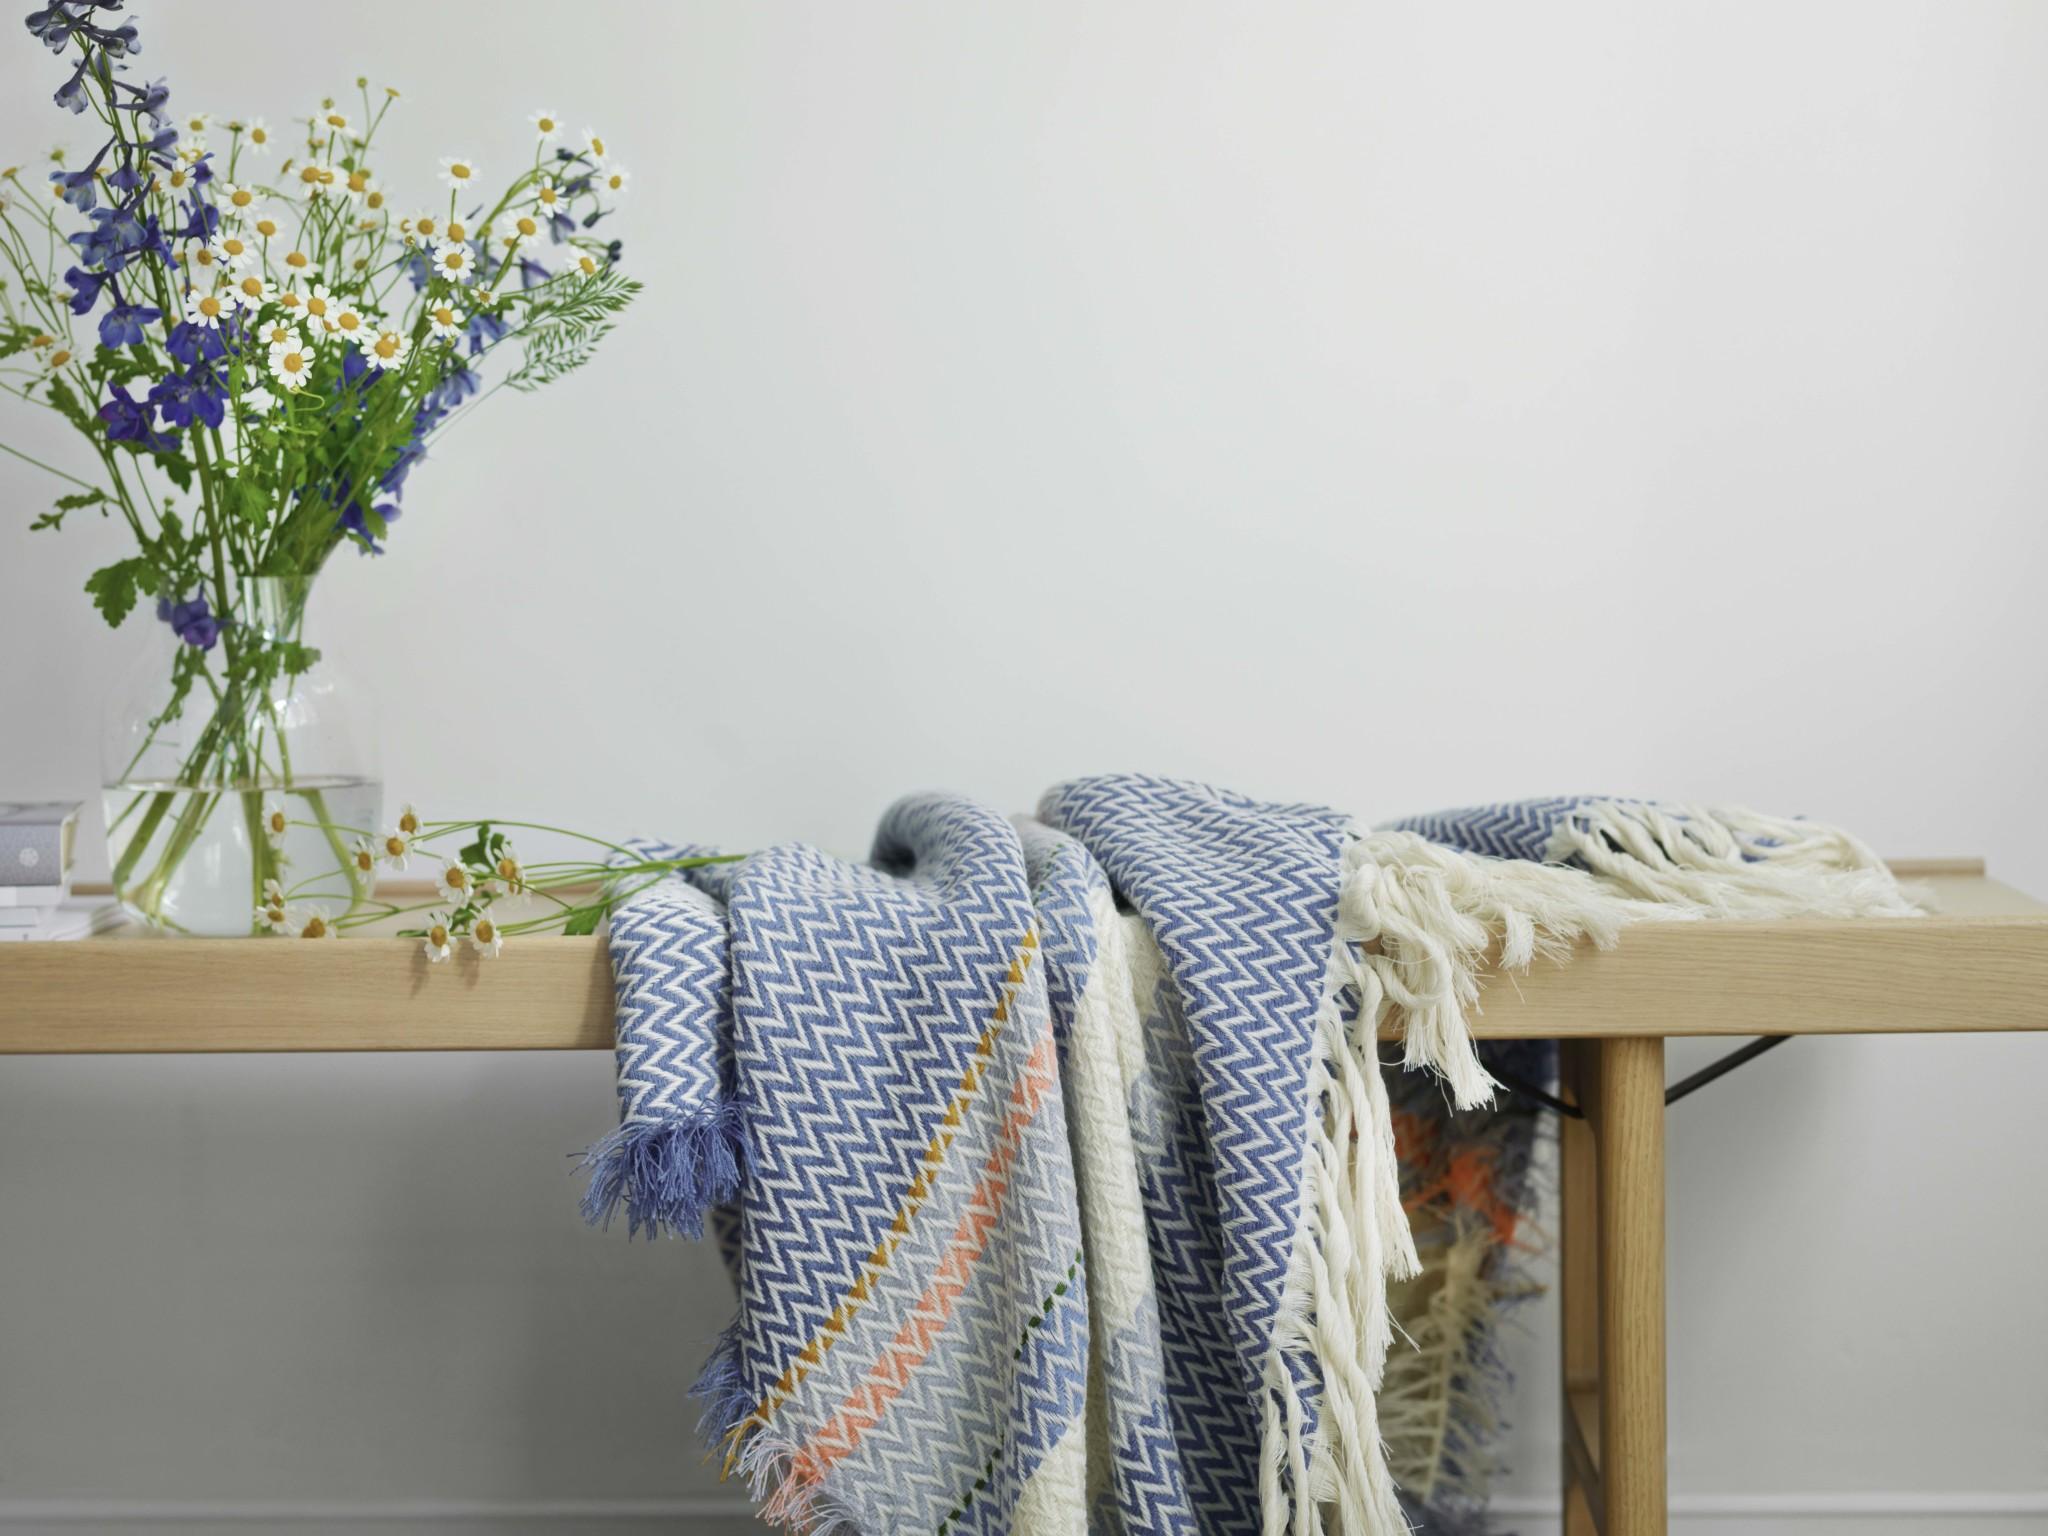 front-Oslo costume-blanket-Anja rod